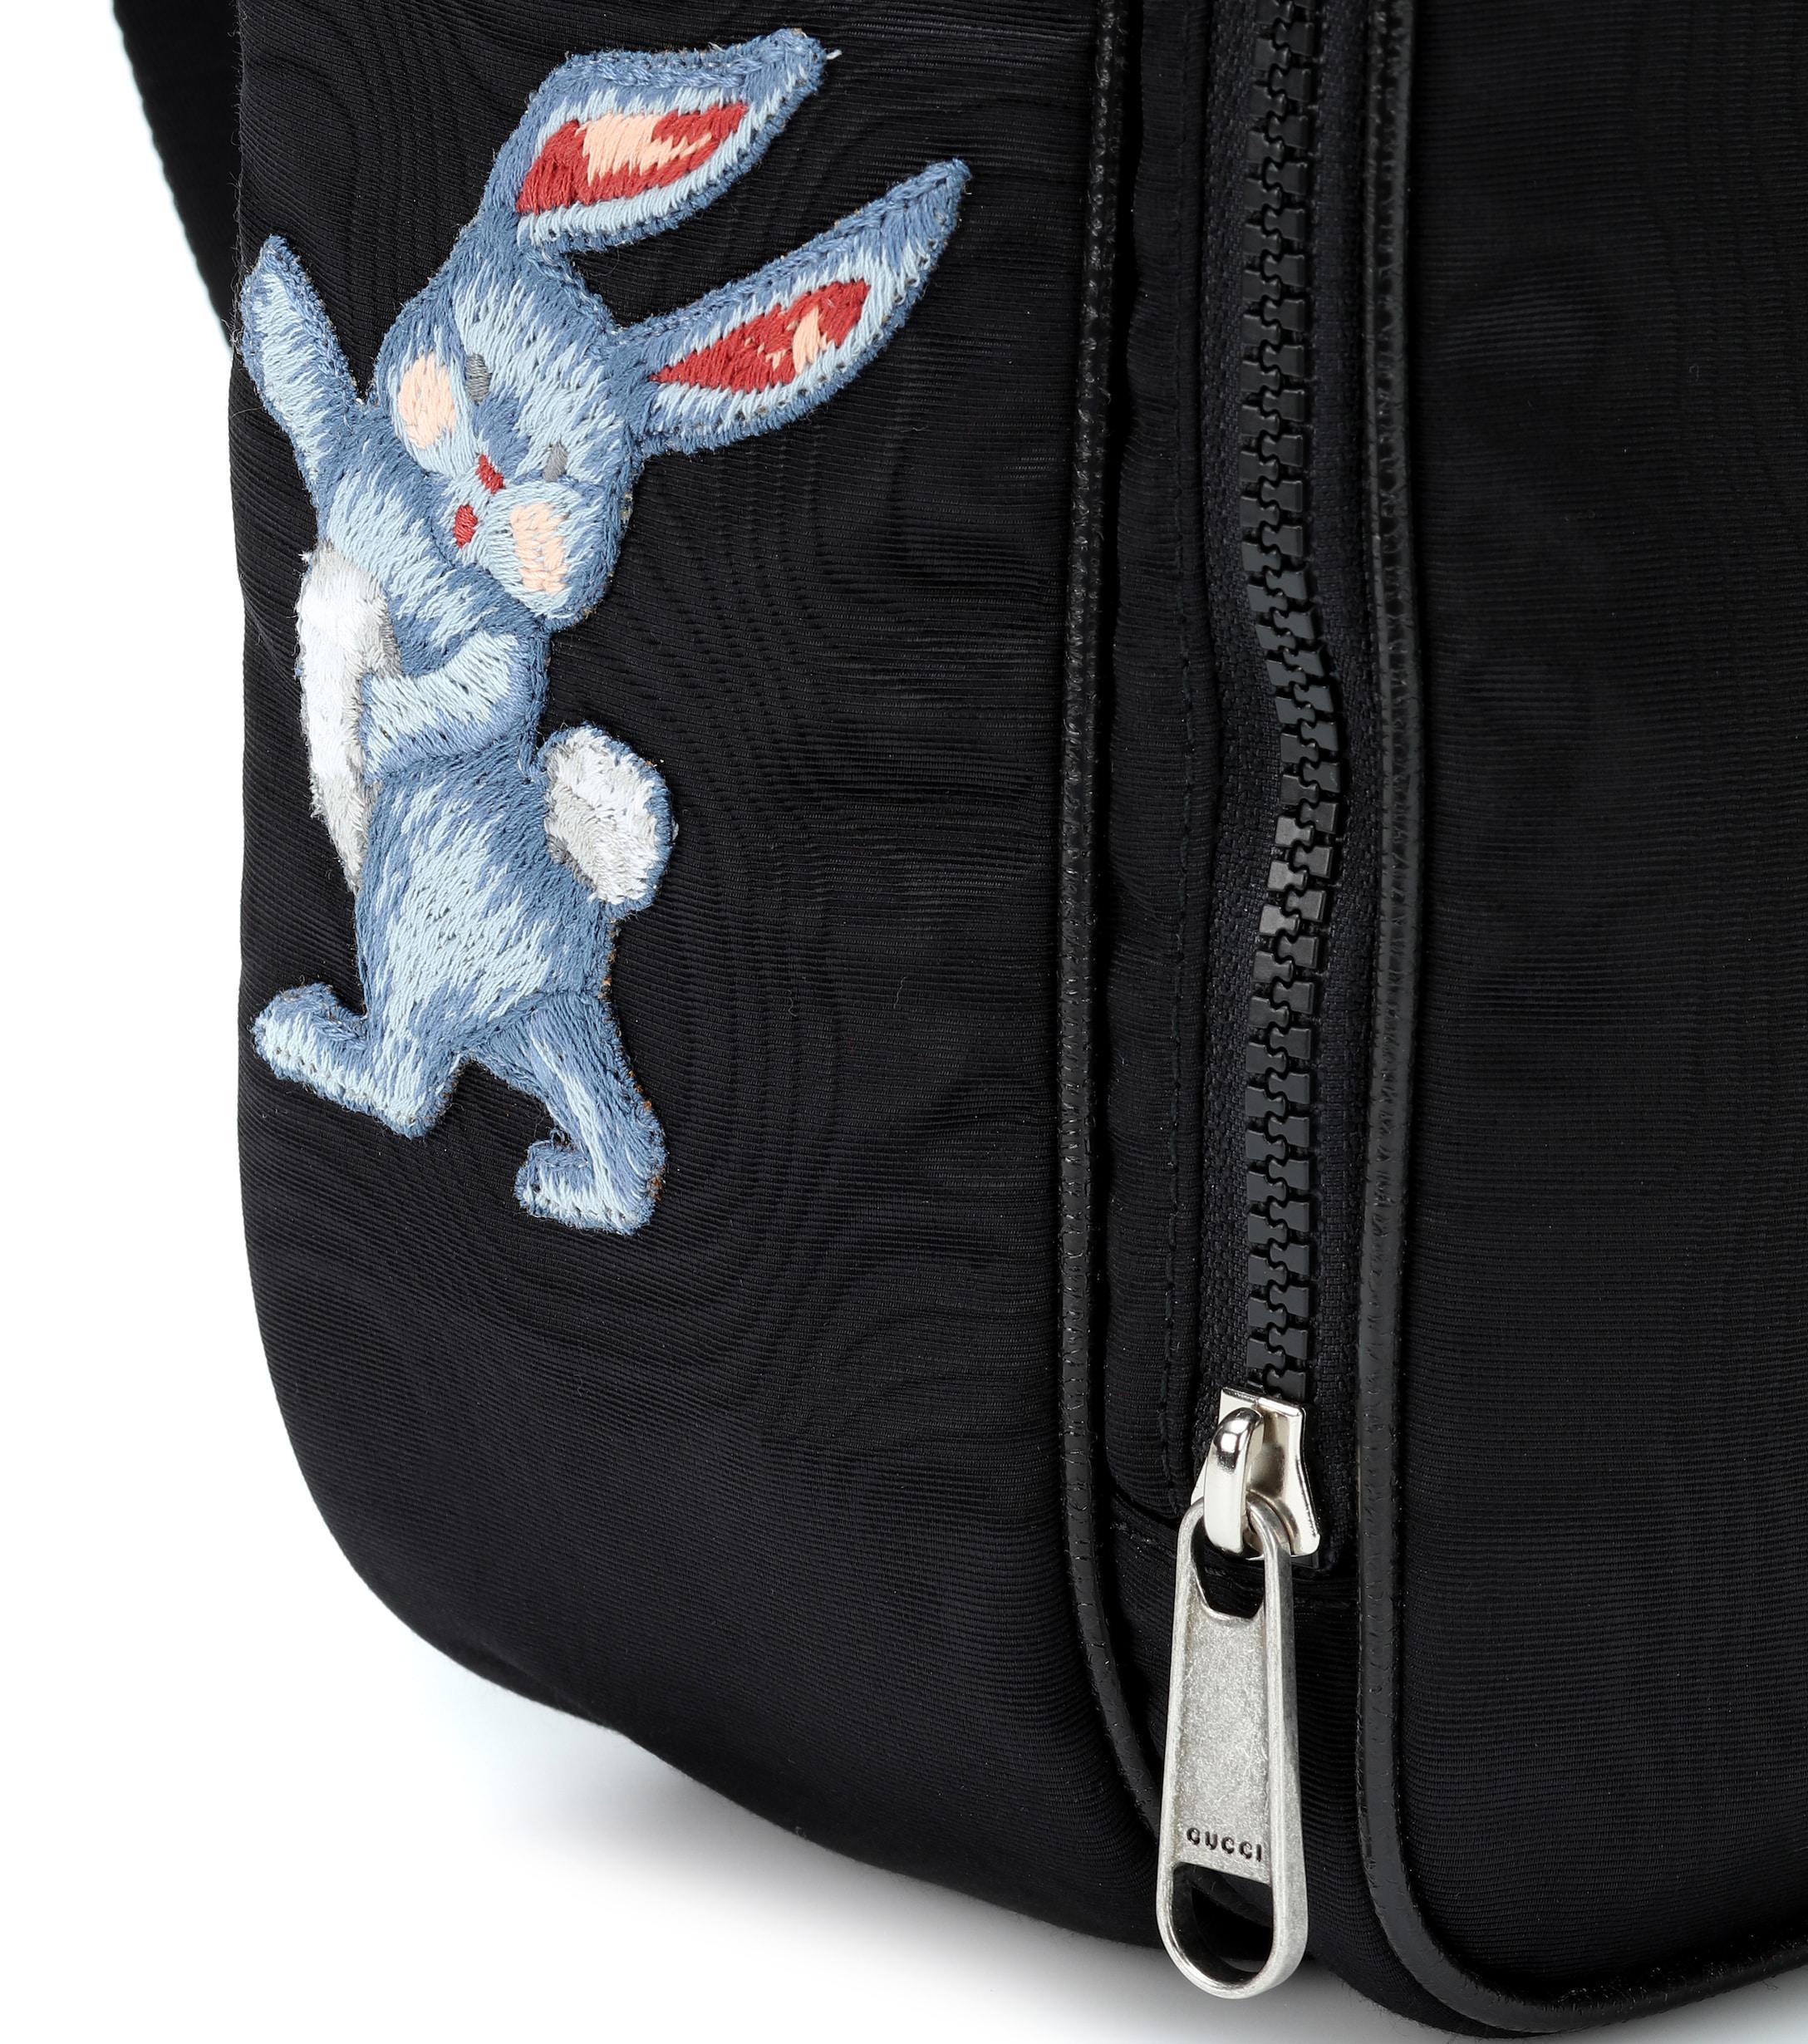 dfbde00e4b3f Gucci - Black Embroidered Medium Backpack - Lyst. View fullscreen